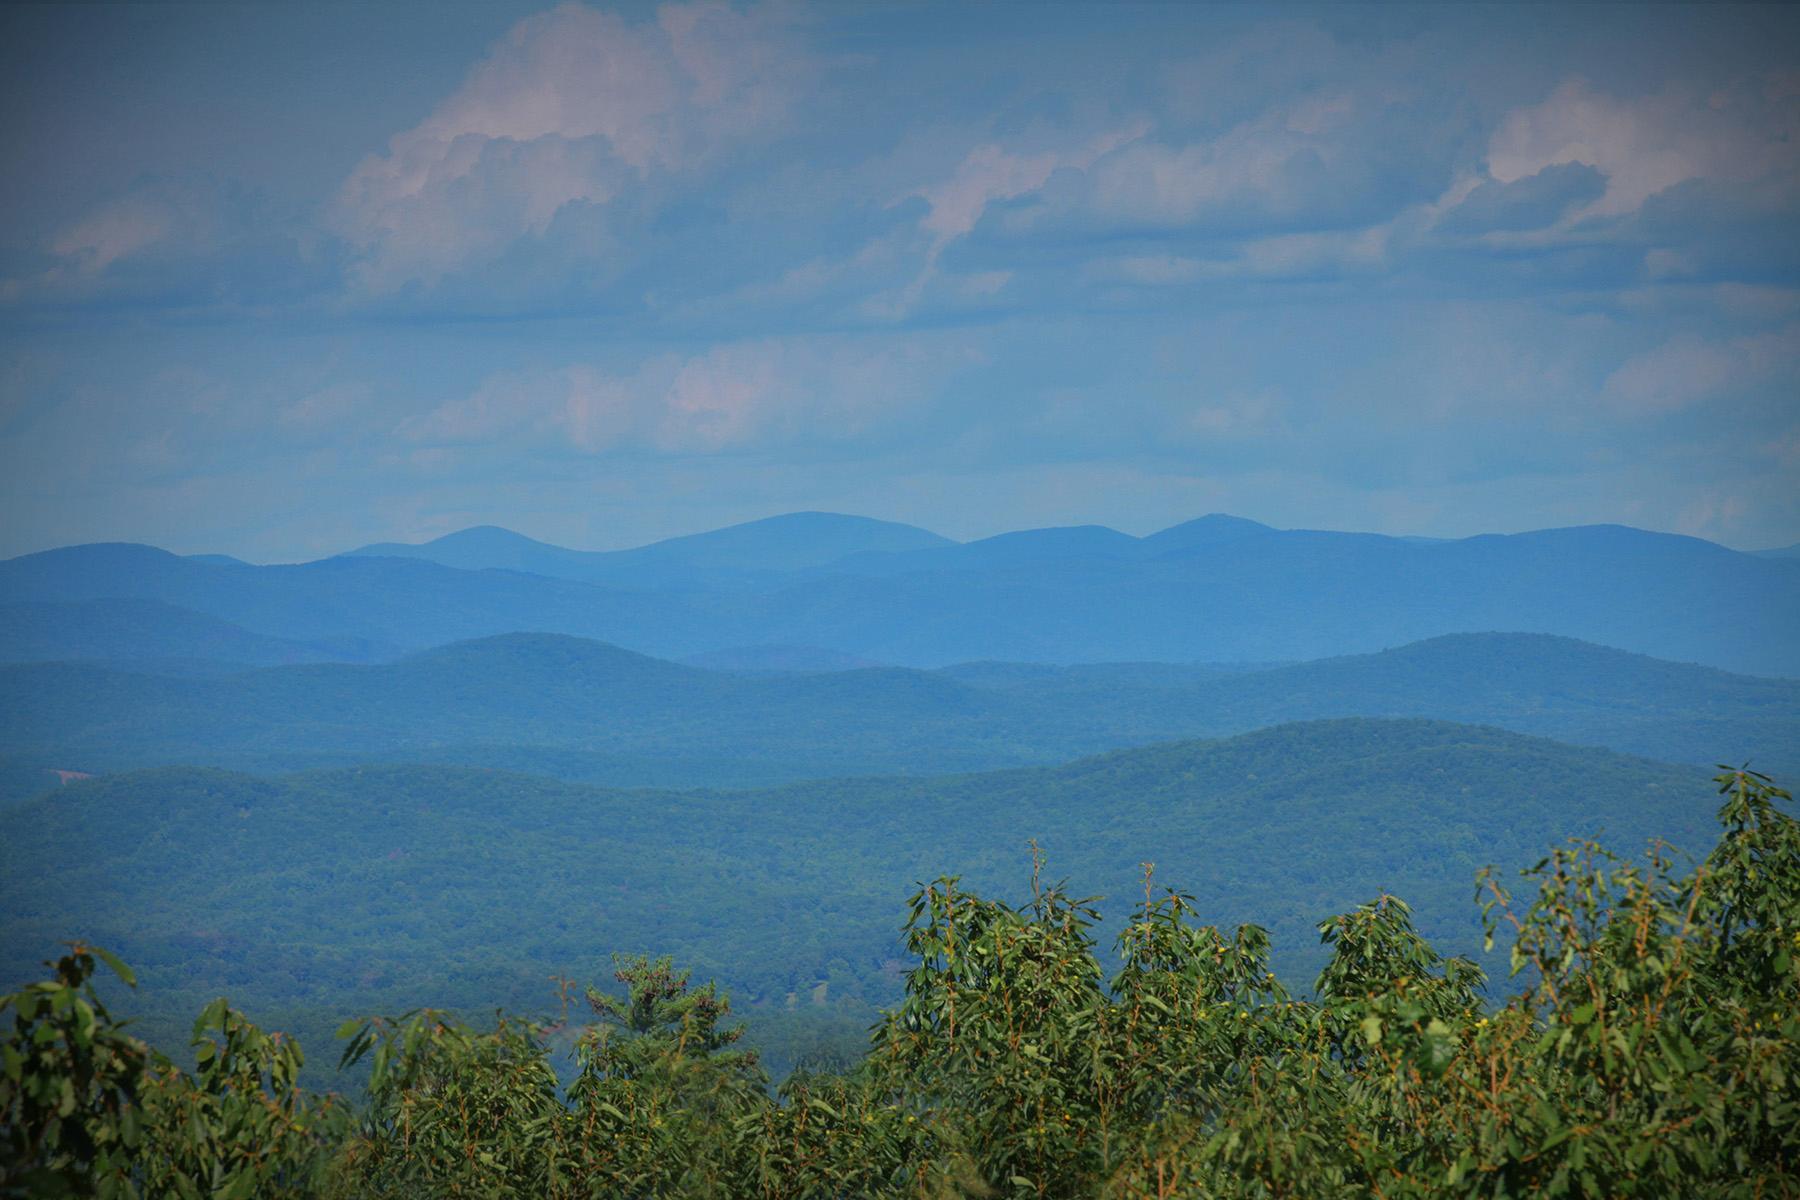 Single Family Home for Sale at Updated Mountain Retreat 154 Bear Cub Ridge Big Canoe, Georgia 30143 United States